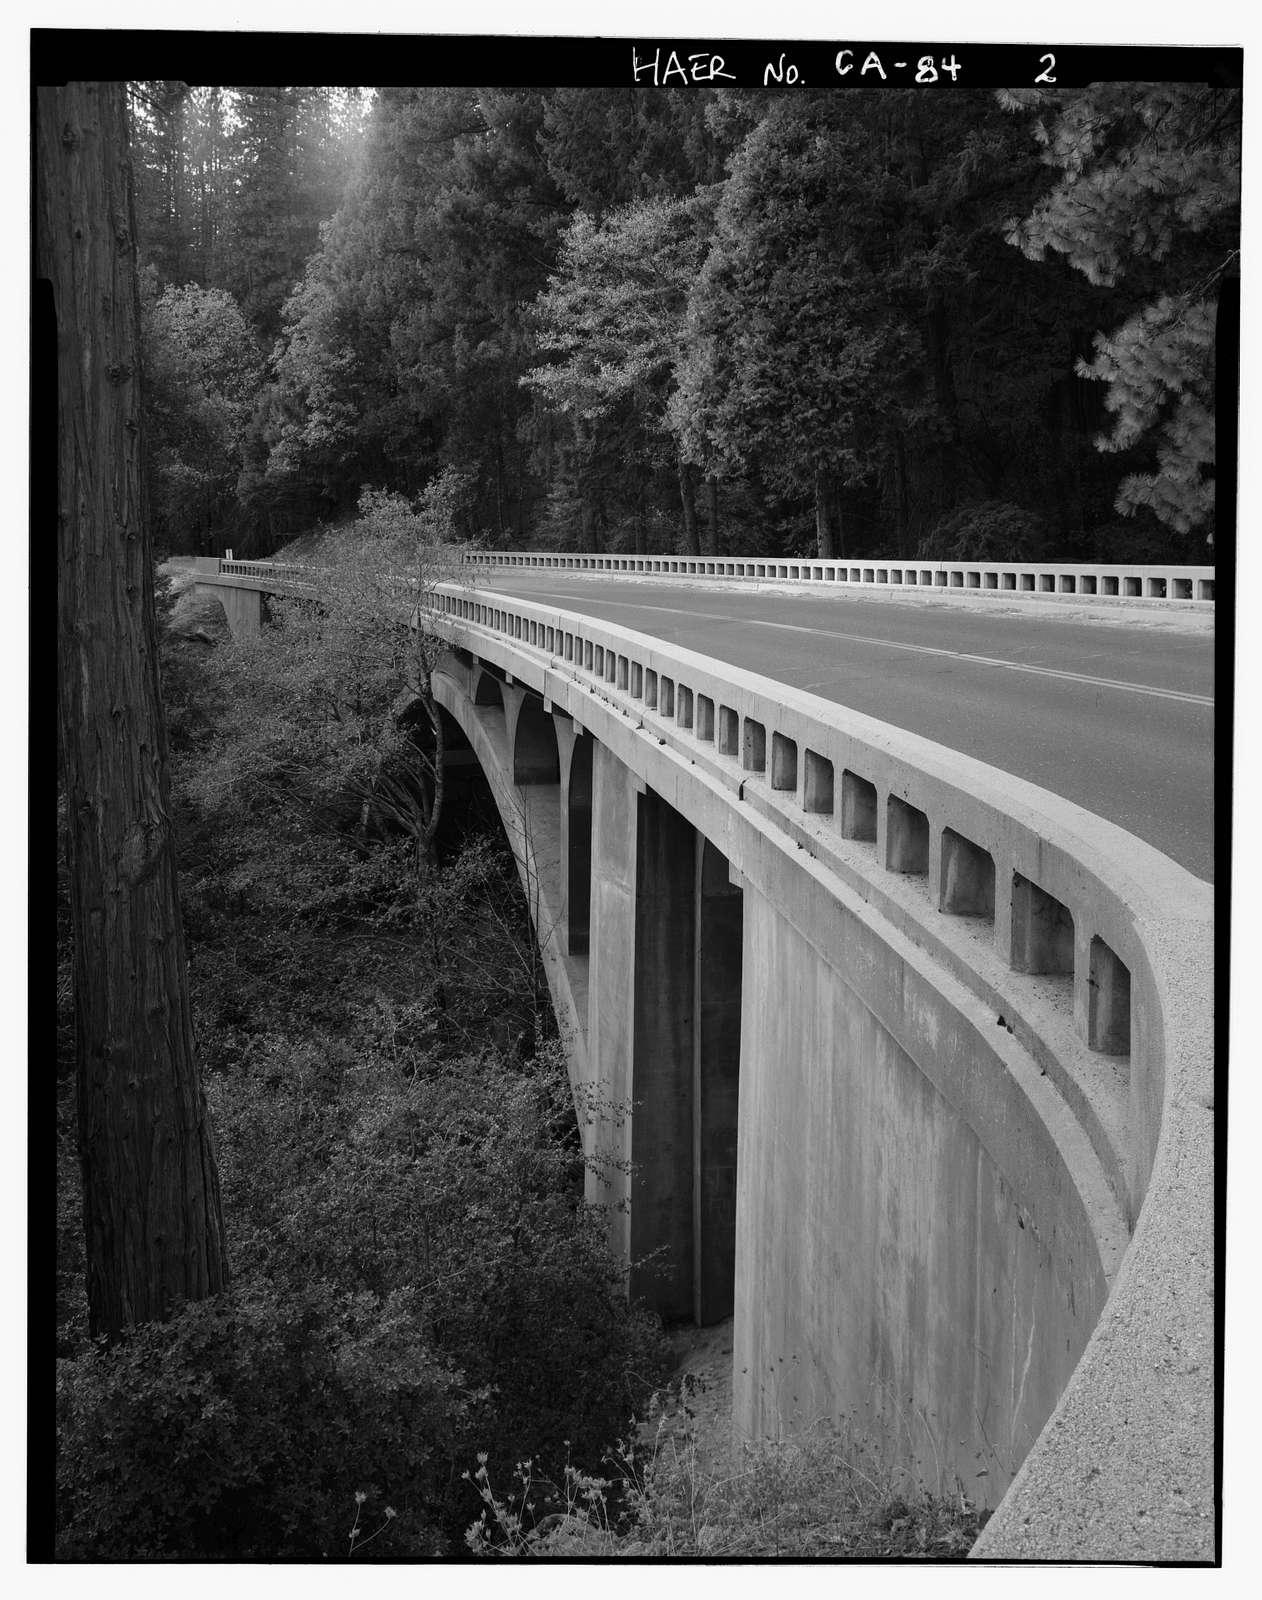 Tamarack Creek Bridge, Spanning Tamarack Creek on New Big Oak Flat Road, Yosemite Village, Mariposa County, CA